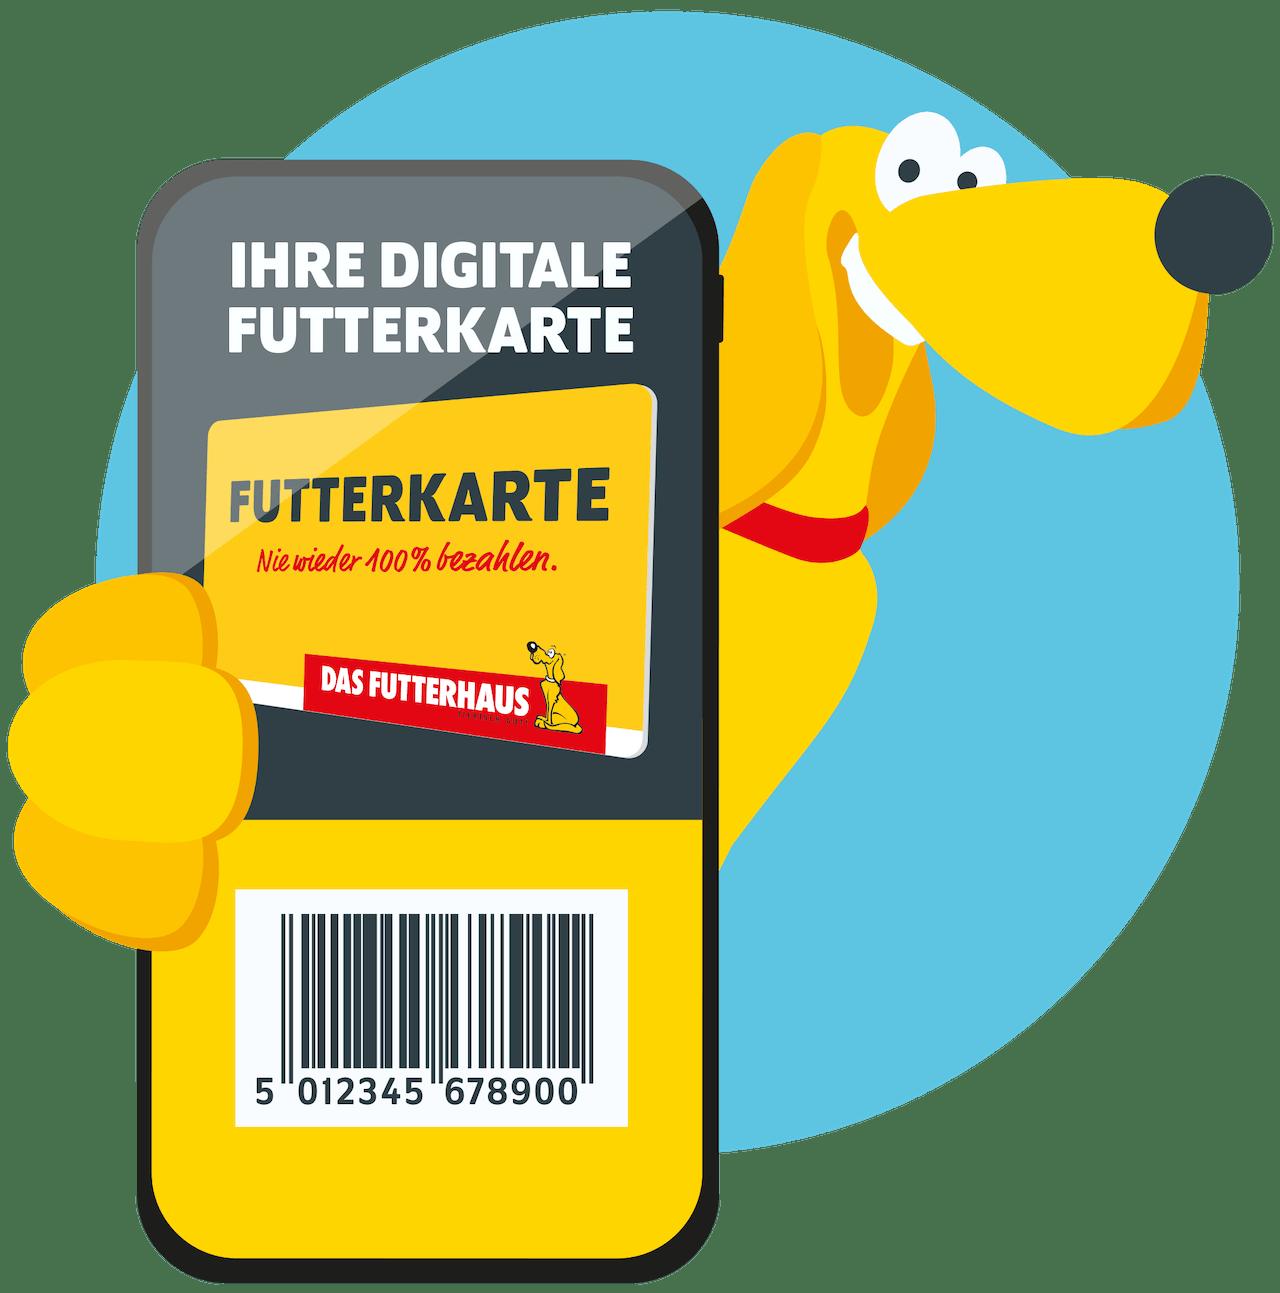 Digitale FUTTERKARTE